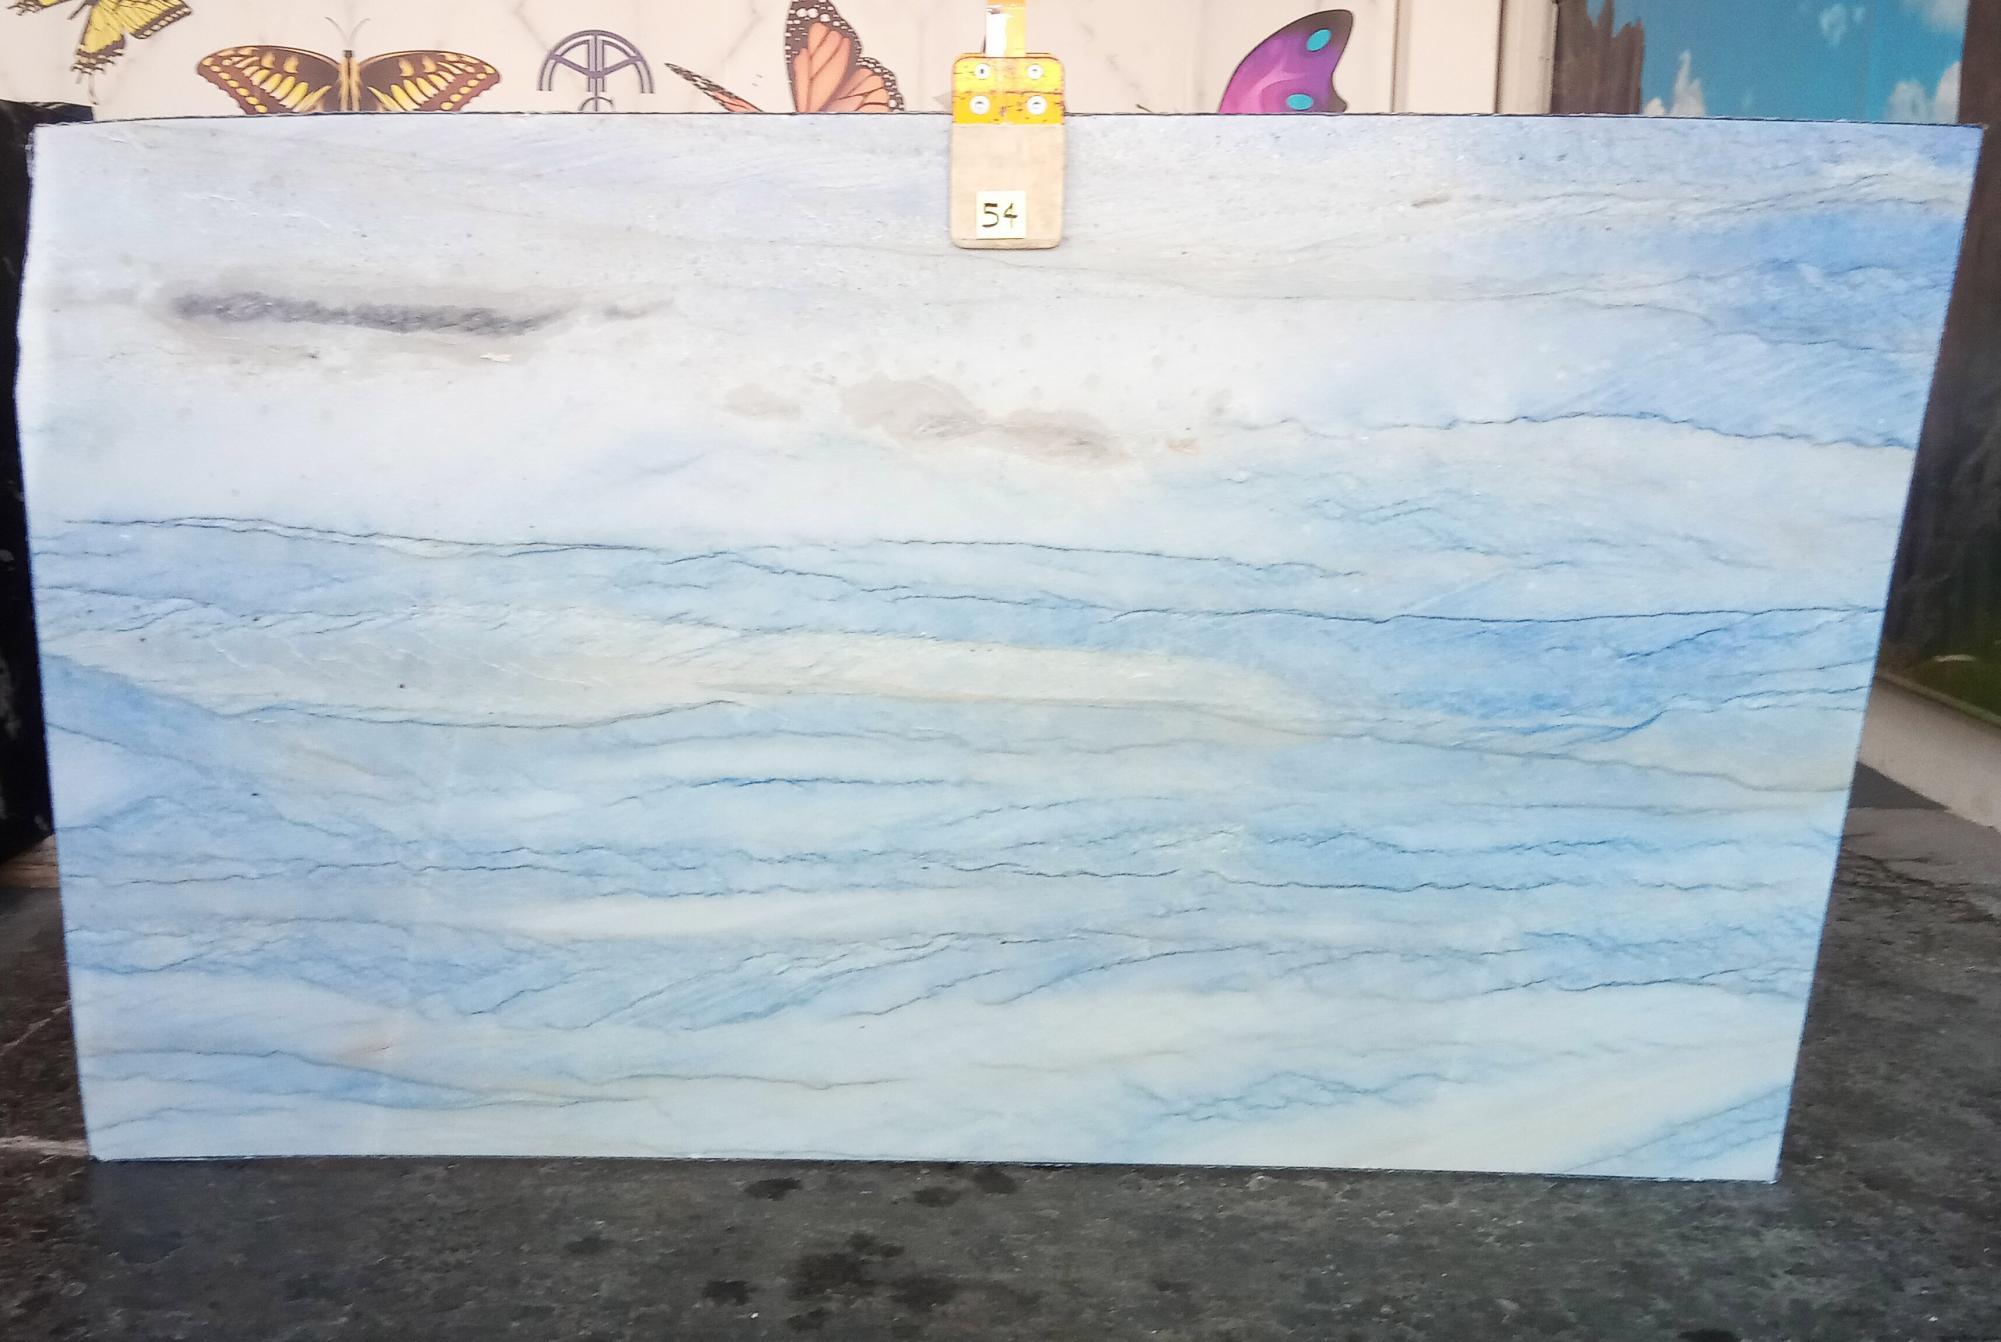 AZUL MAKAUBA Fourniture Veneto (Italie) d' dalles brillantes en marbre naturel Z0191 , Slab #54